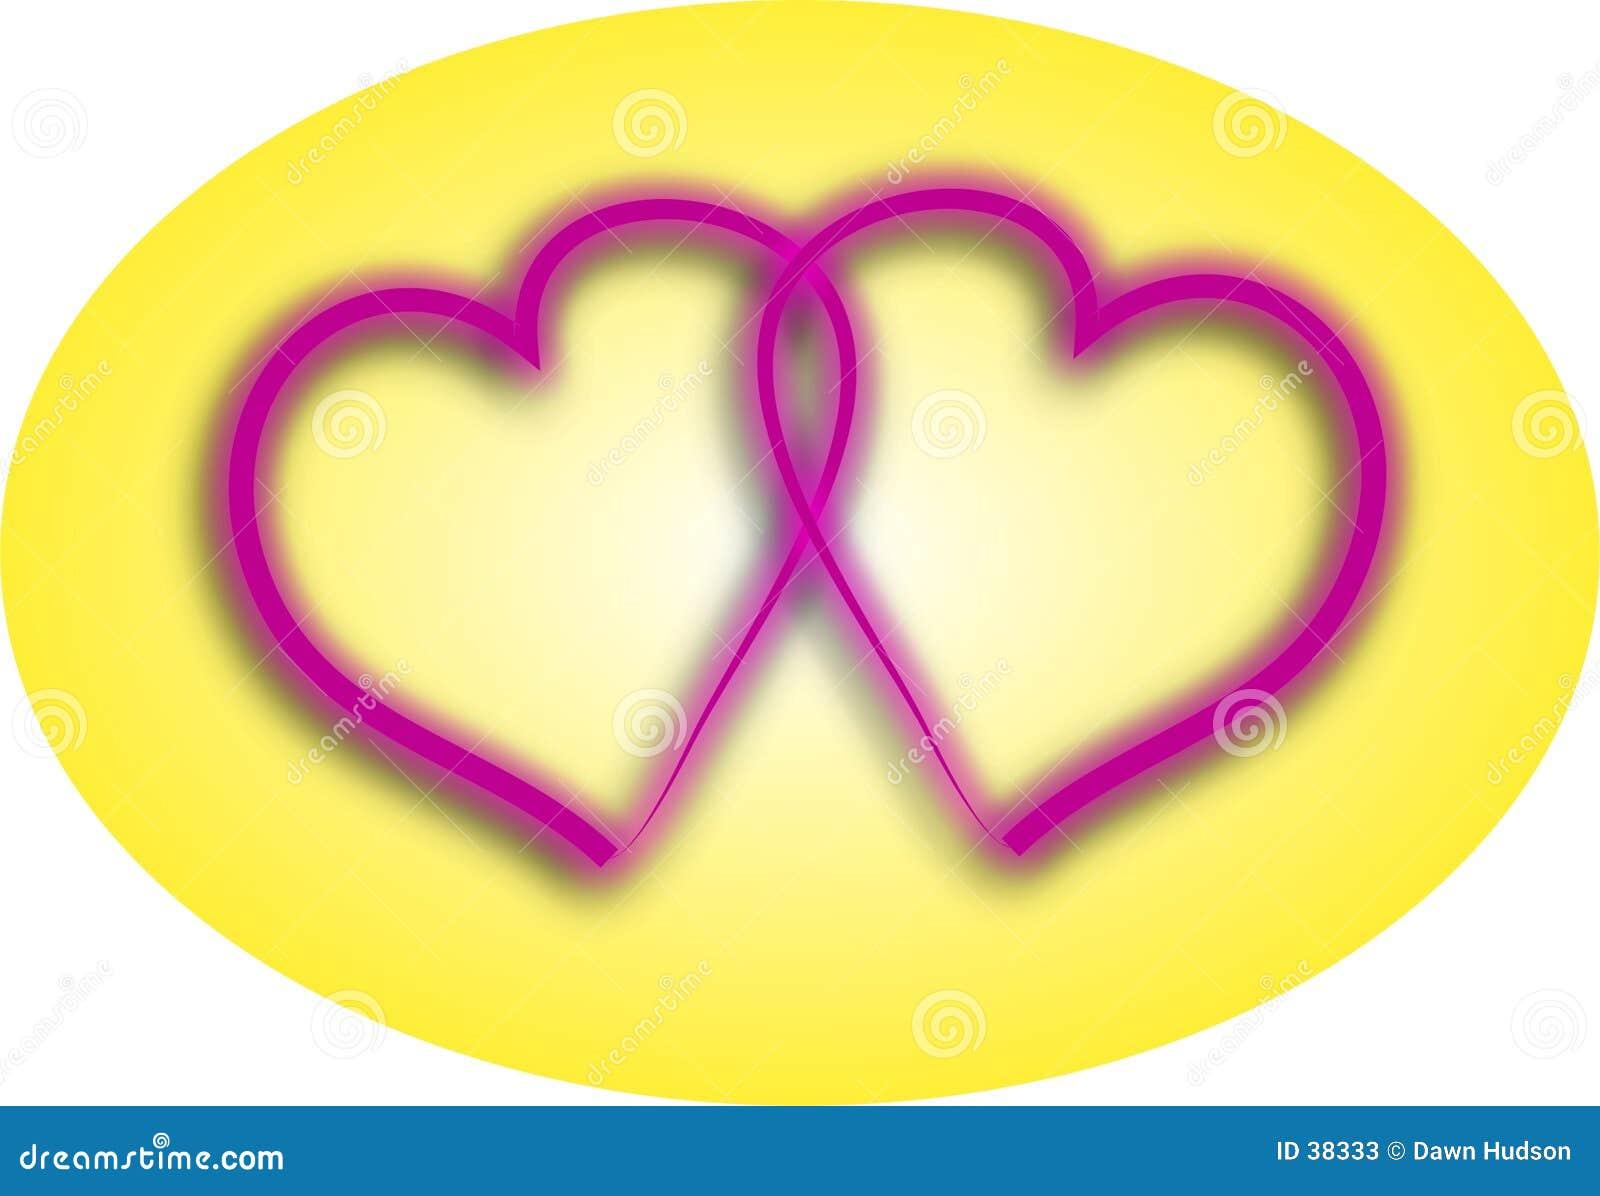 Download Uces Par De Corazones Del Amor Stock de ilustración - Ilustración de junto, corazones: 38333